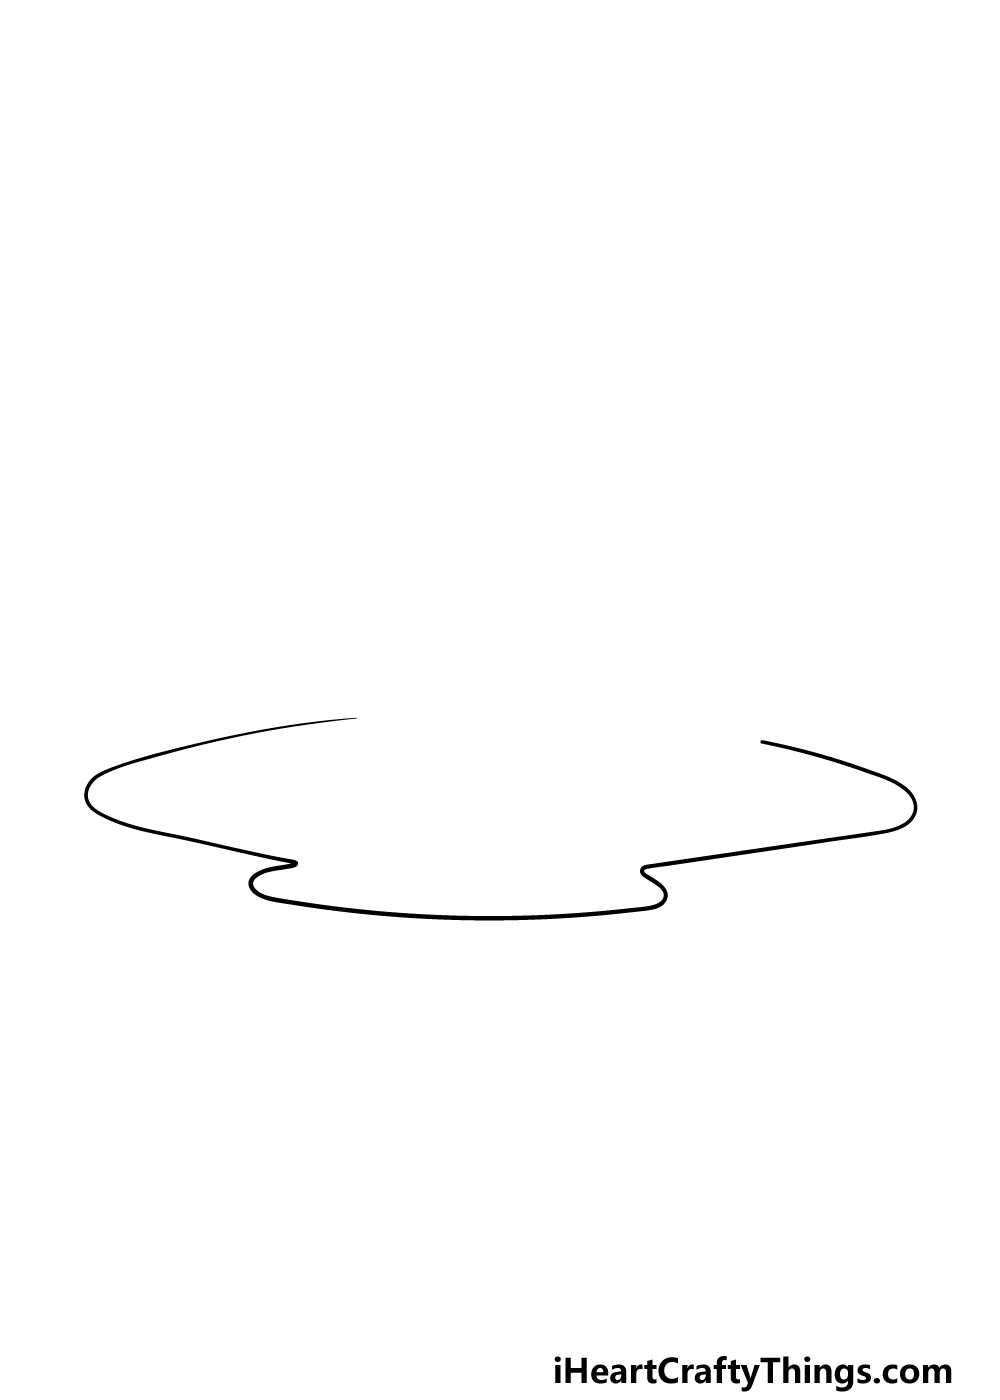 drawing an island step 1